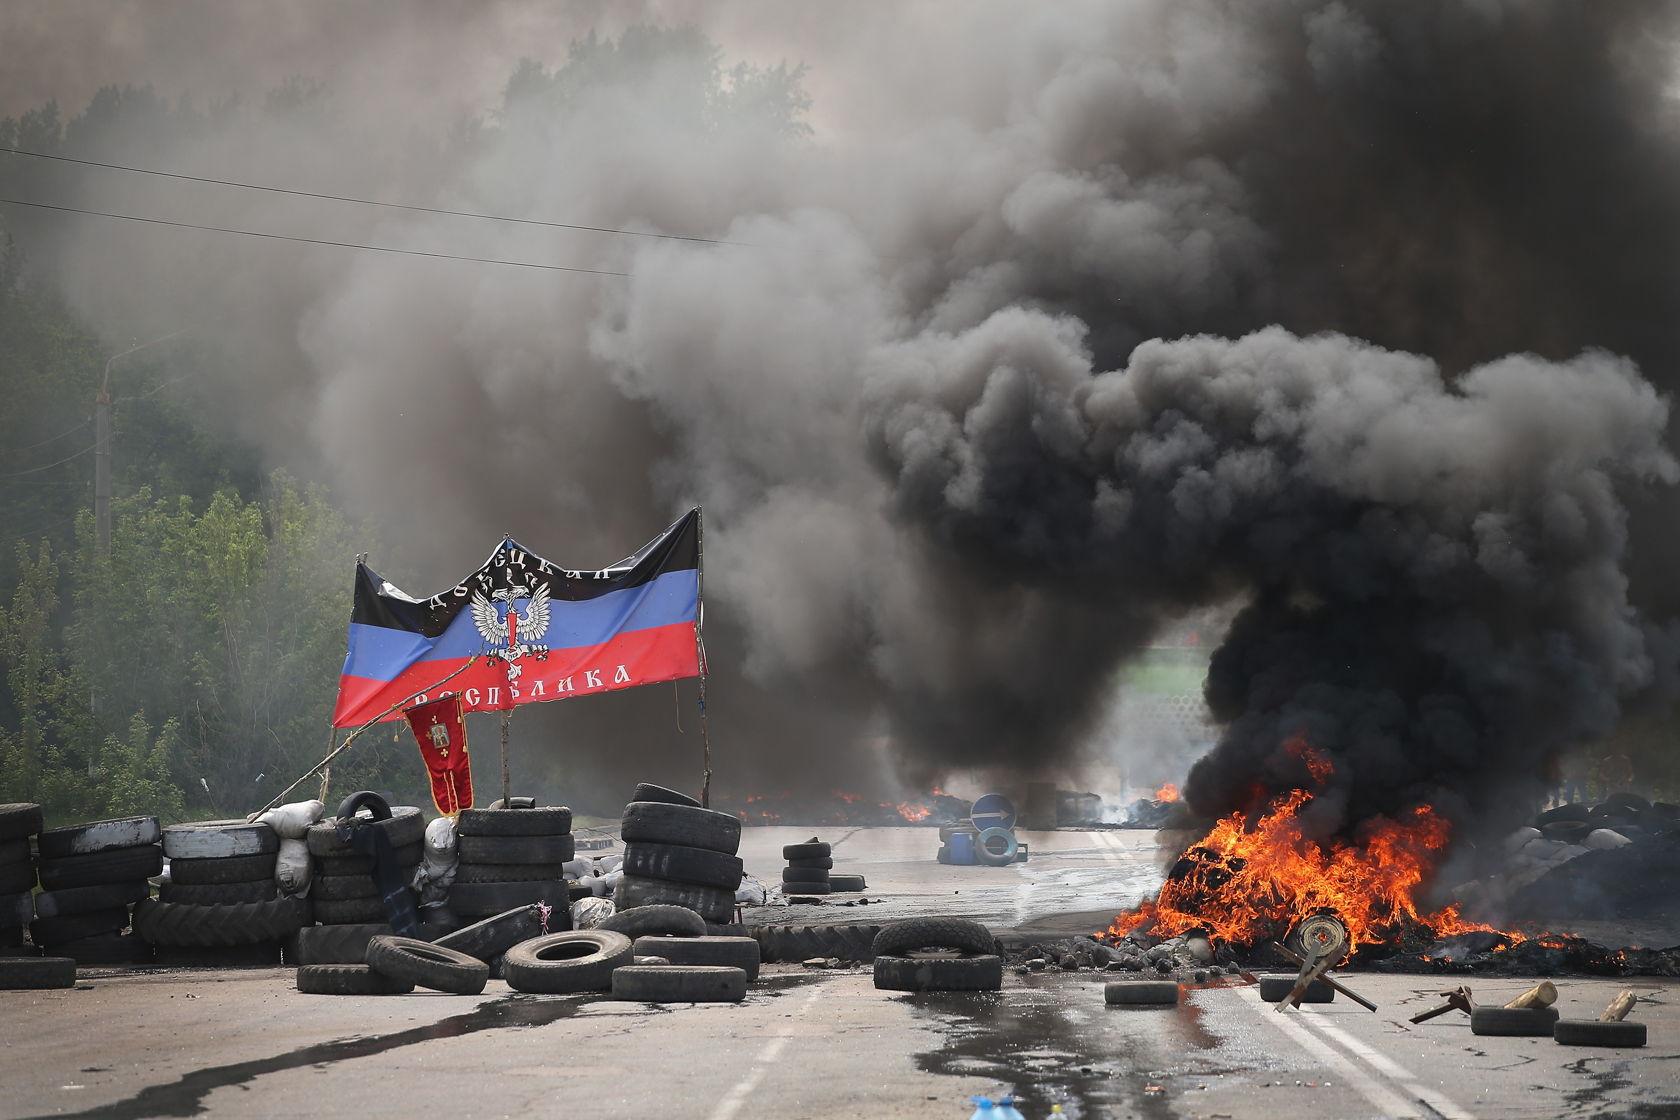 Violence Against Civilians In Ukraine Seen As Genocide